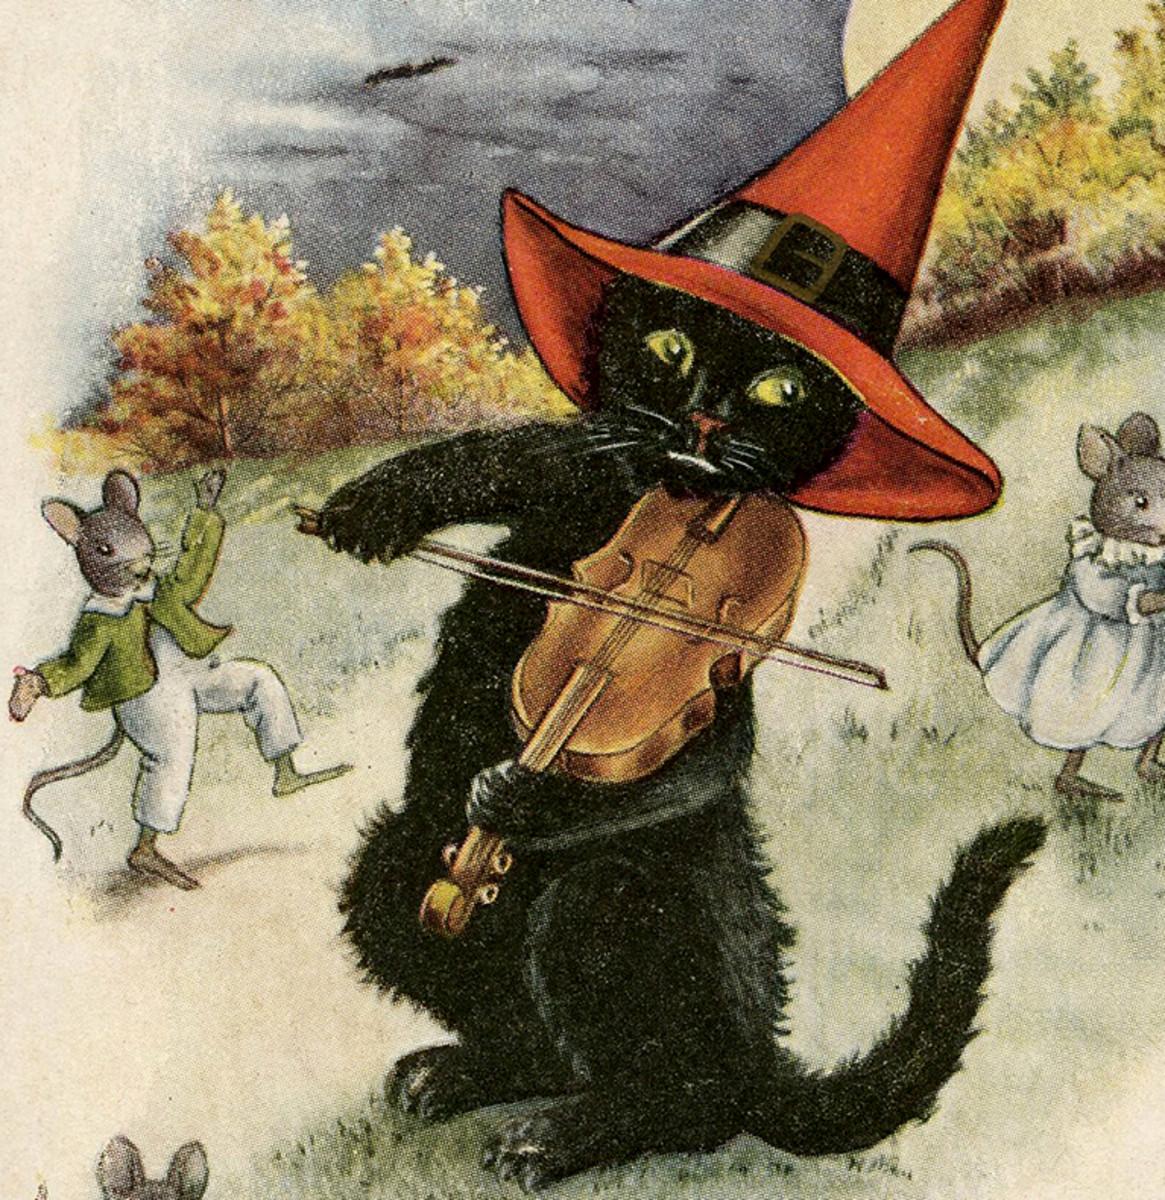 Black cat in a witch's hat, vintage illustration.